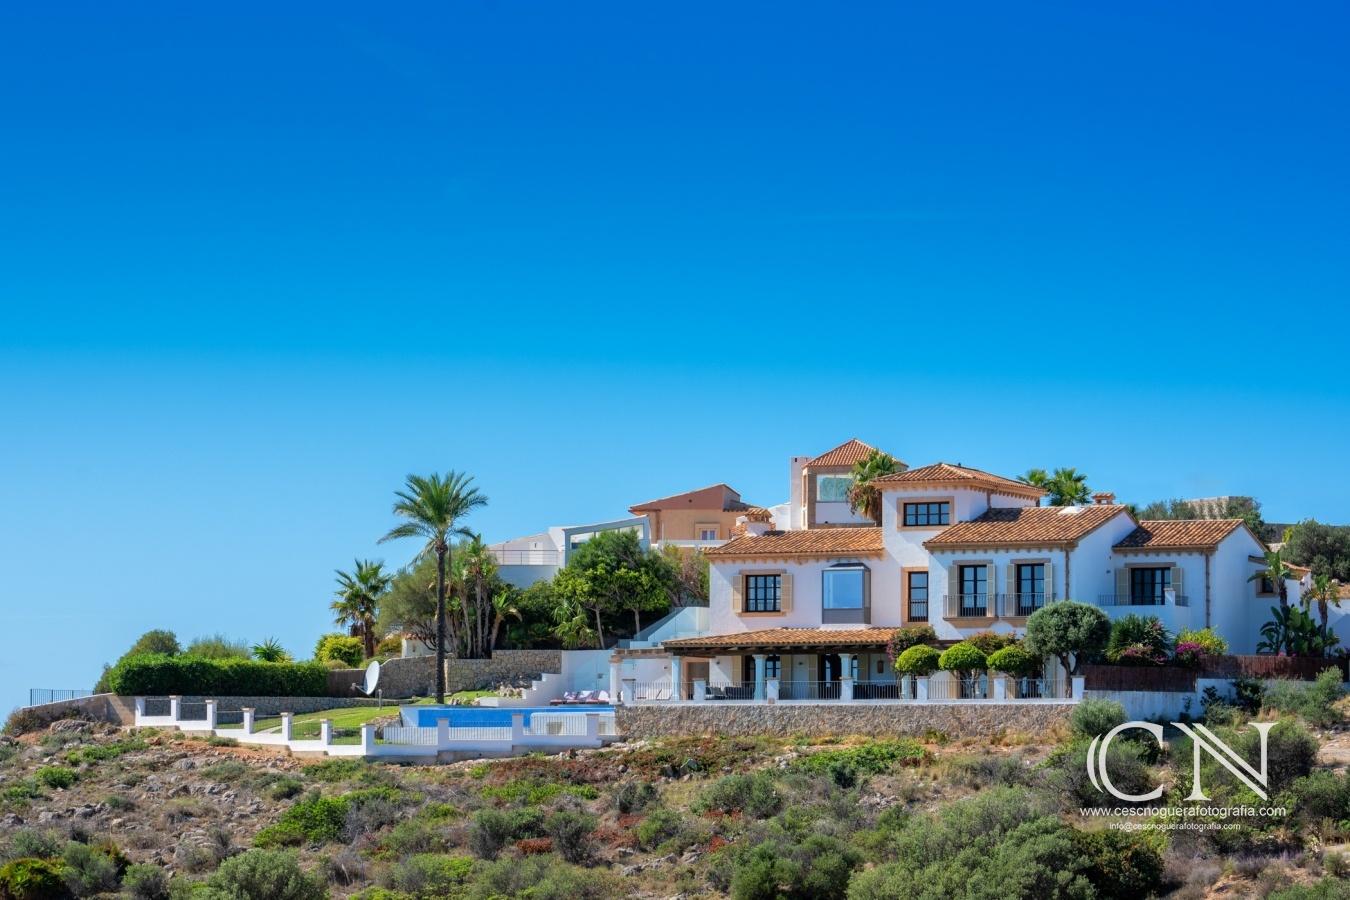 Finca al Port d'Andratx - Cesc Noguera Fotografia,  Architectural & Interior design photographer / Landscape Photography.